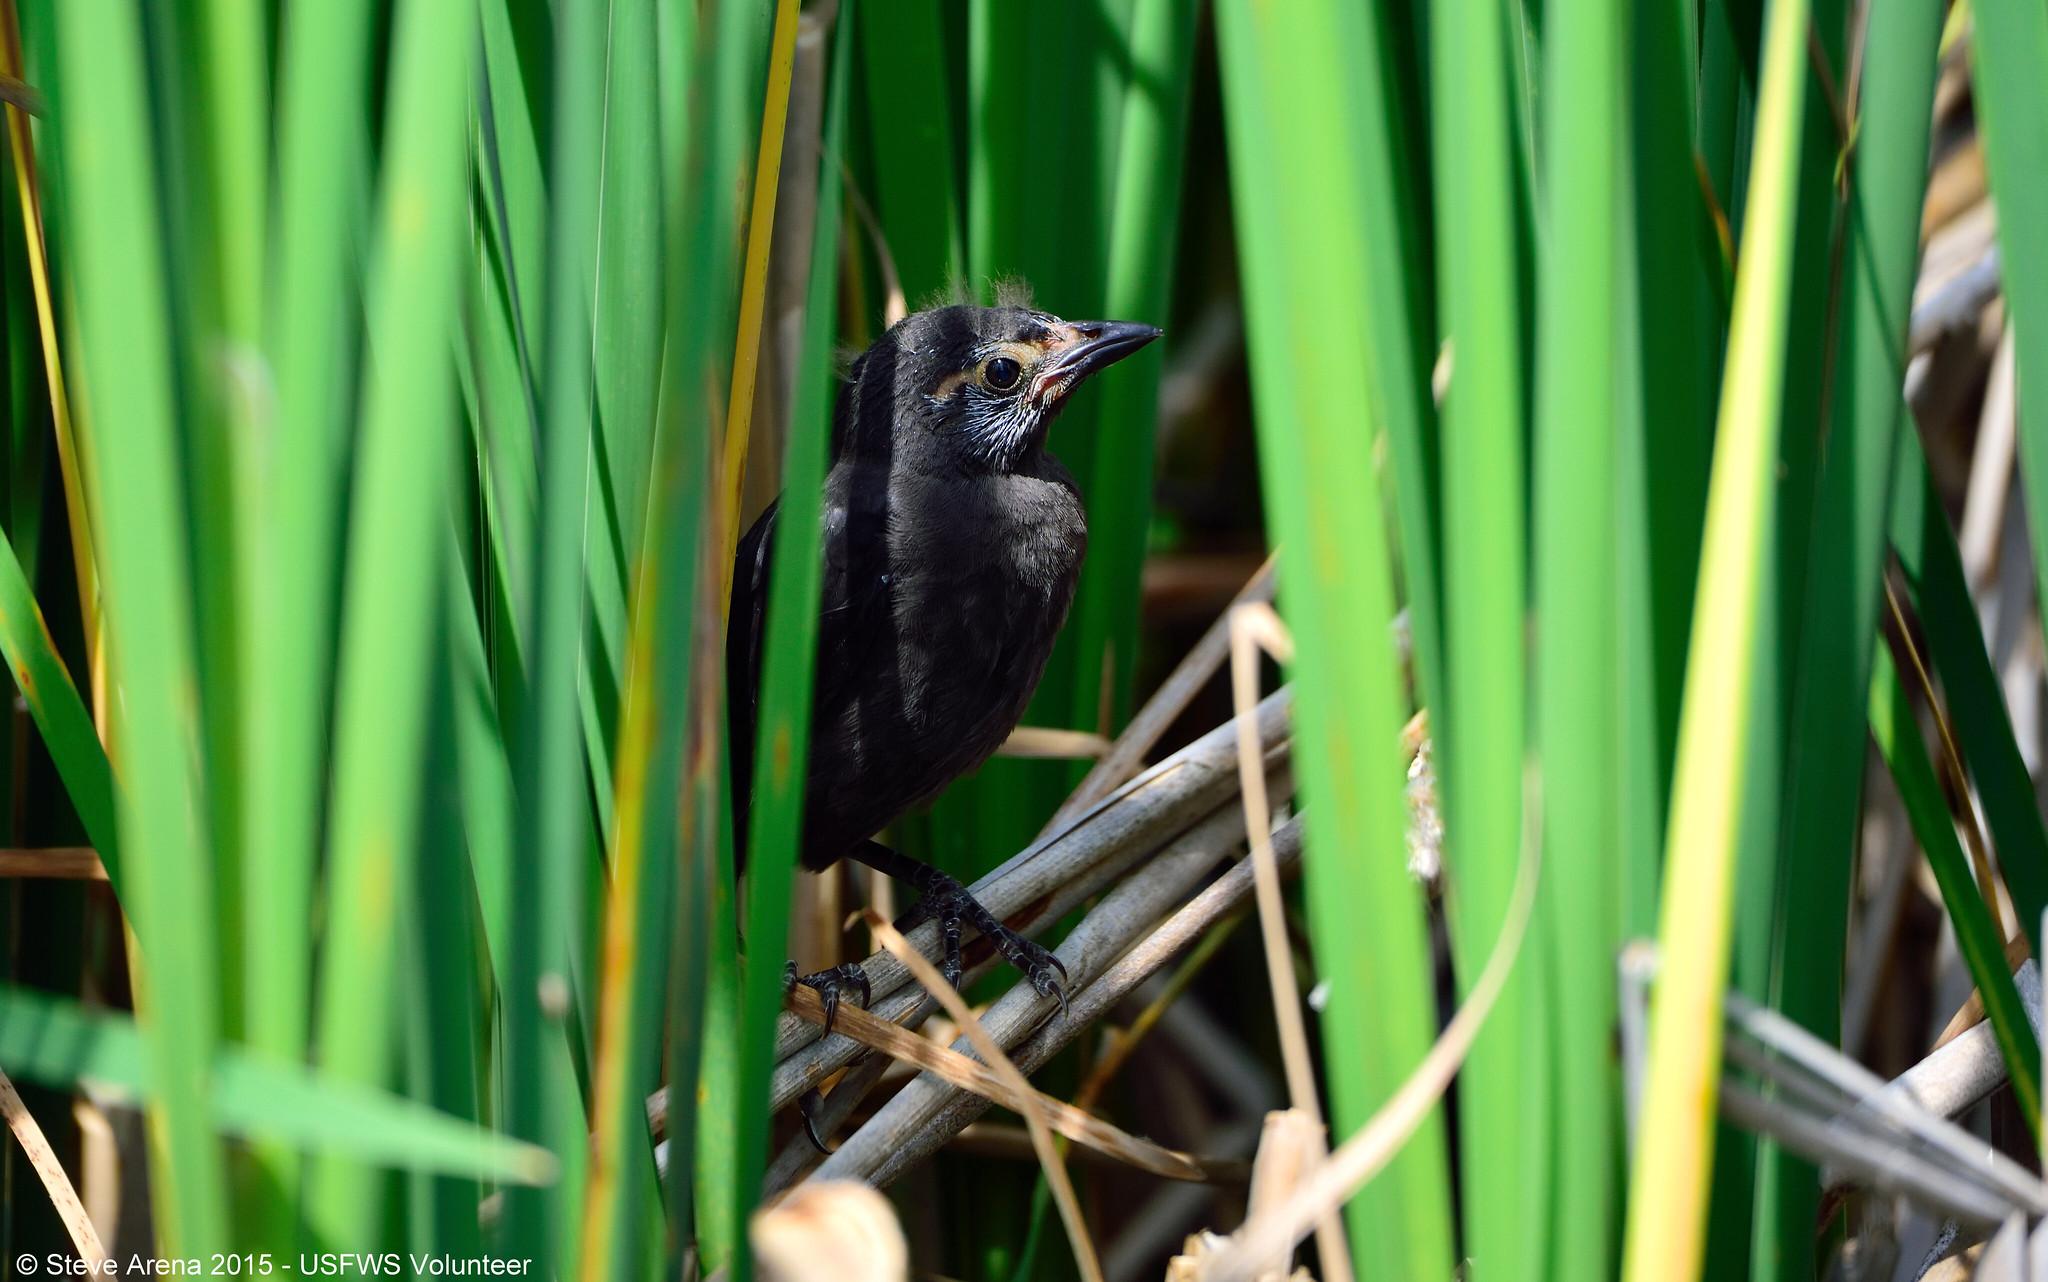 fledgling grackle - photo #23